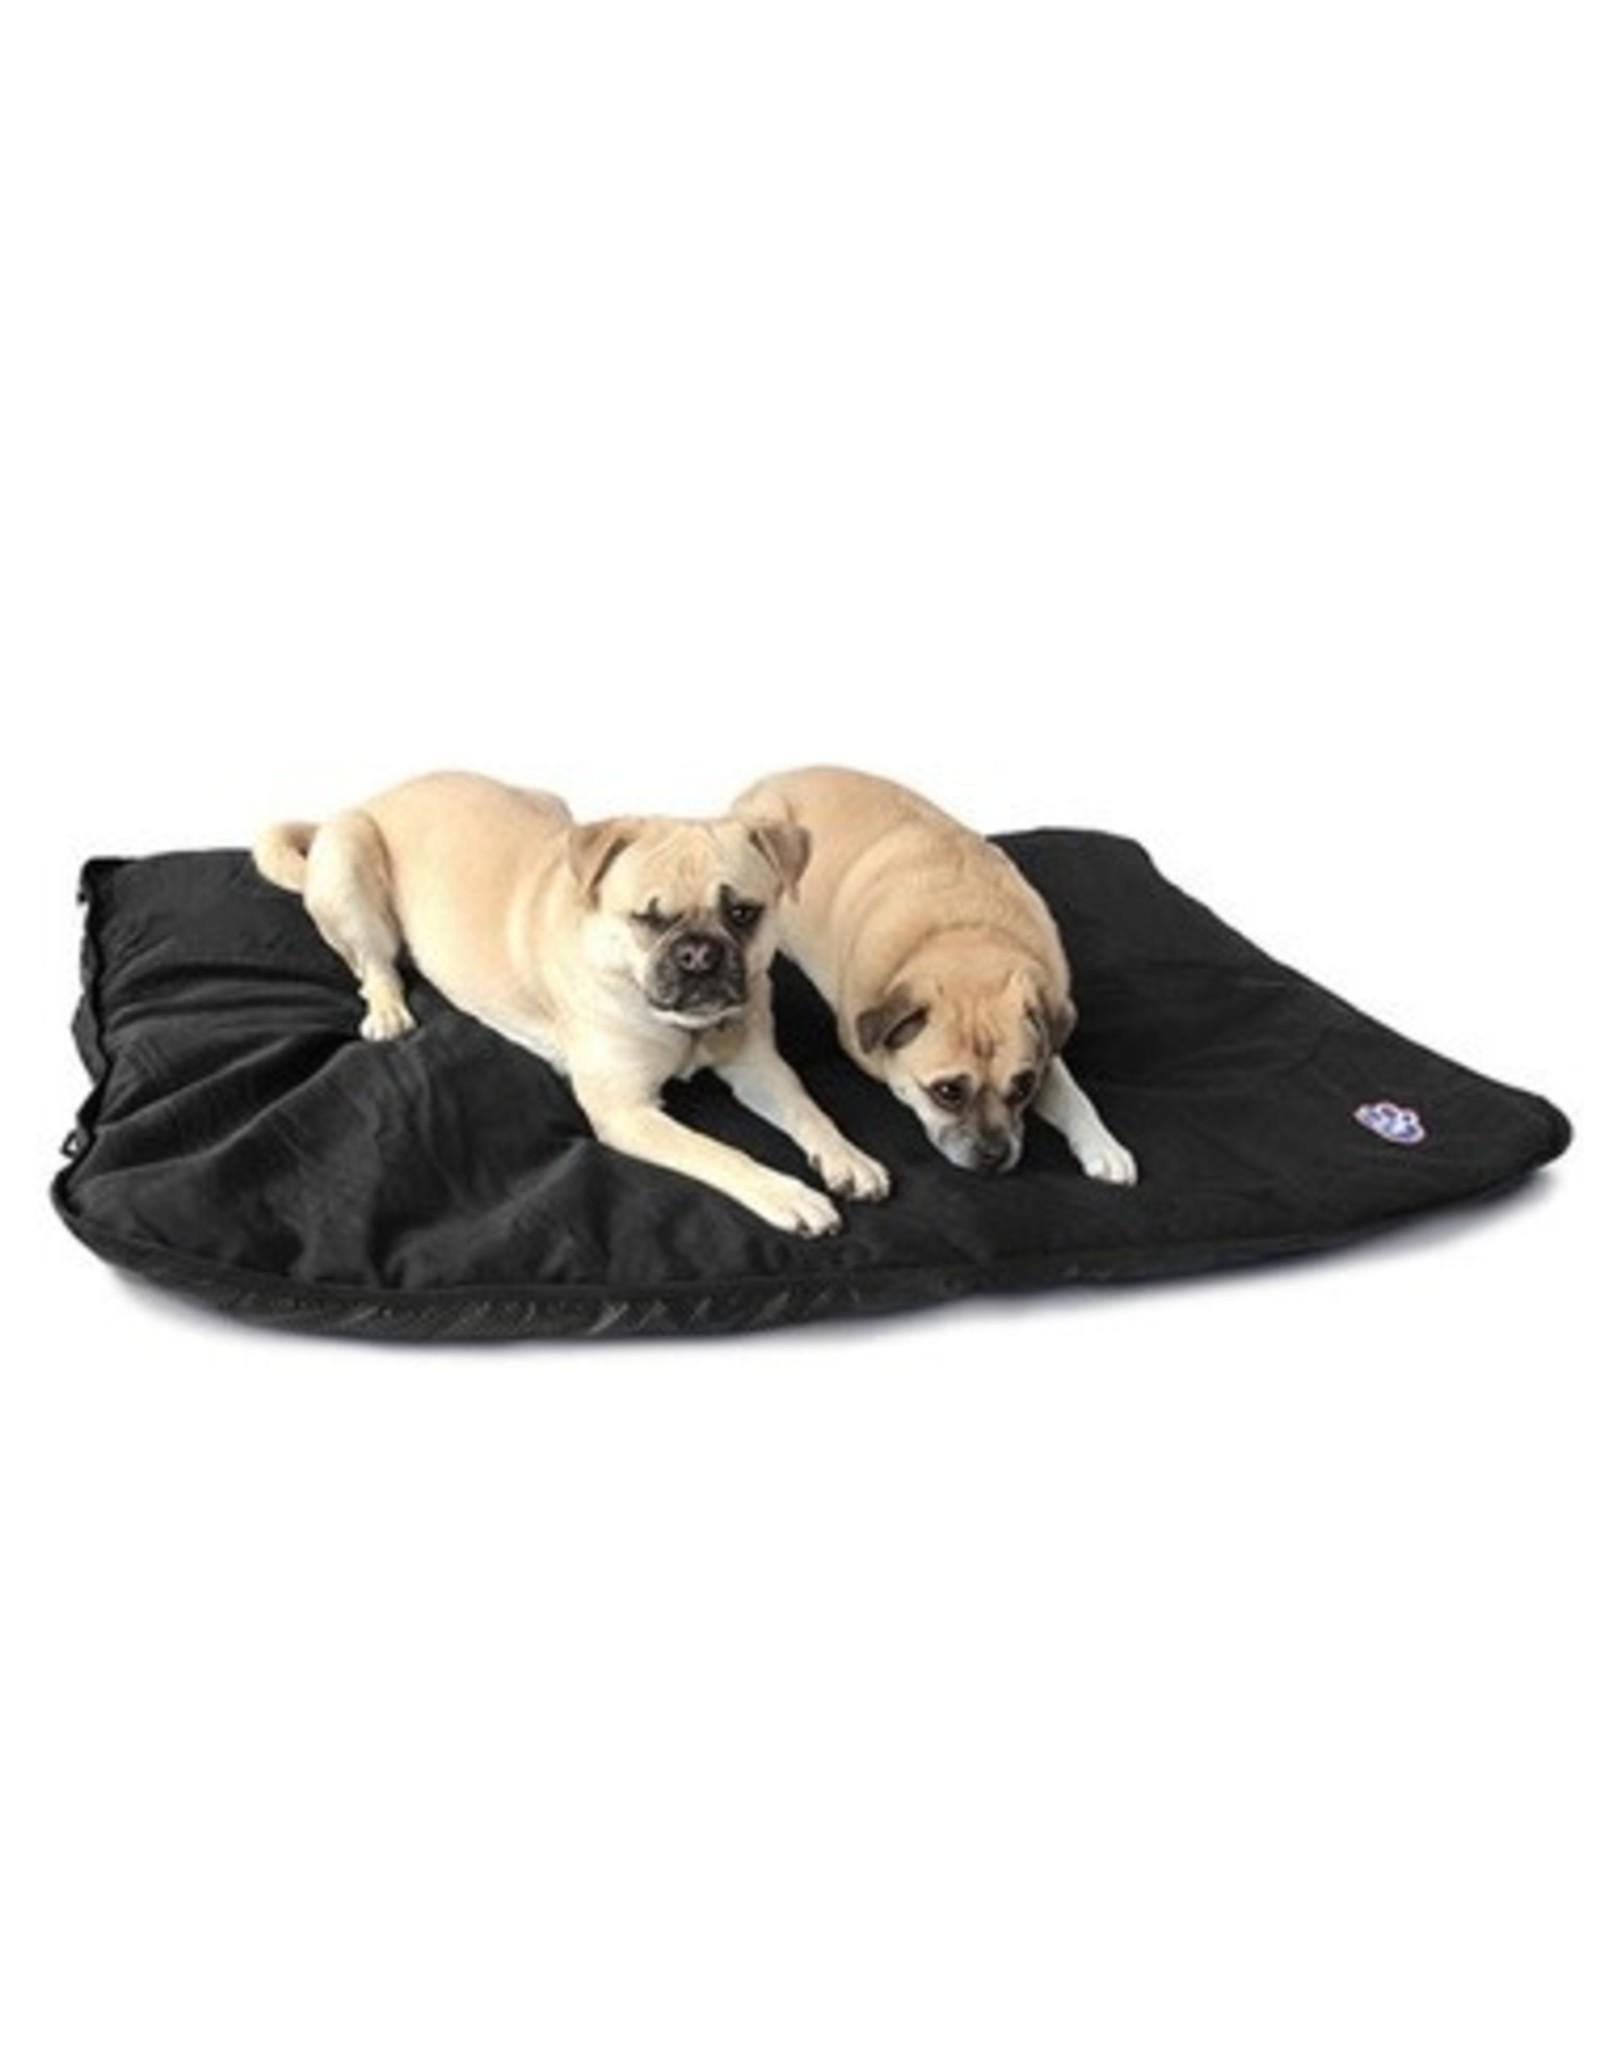 Canada Pooch Canada Pooch Rugged Rest Travel Bed Black MED